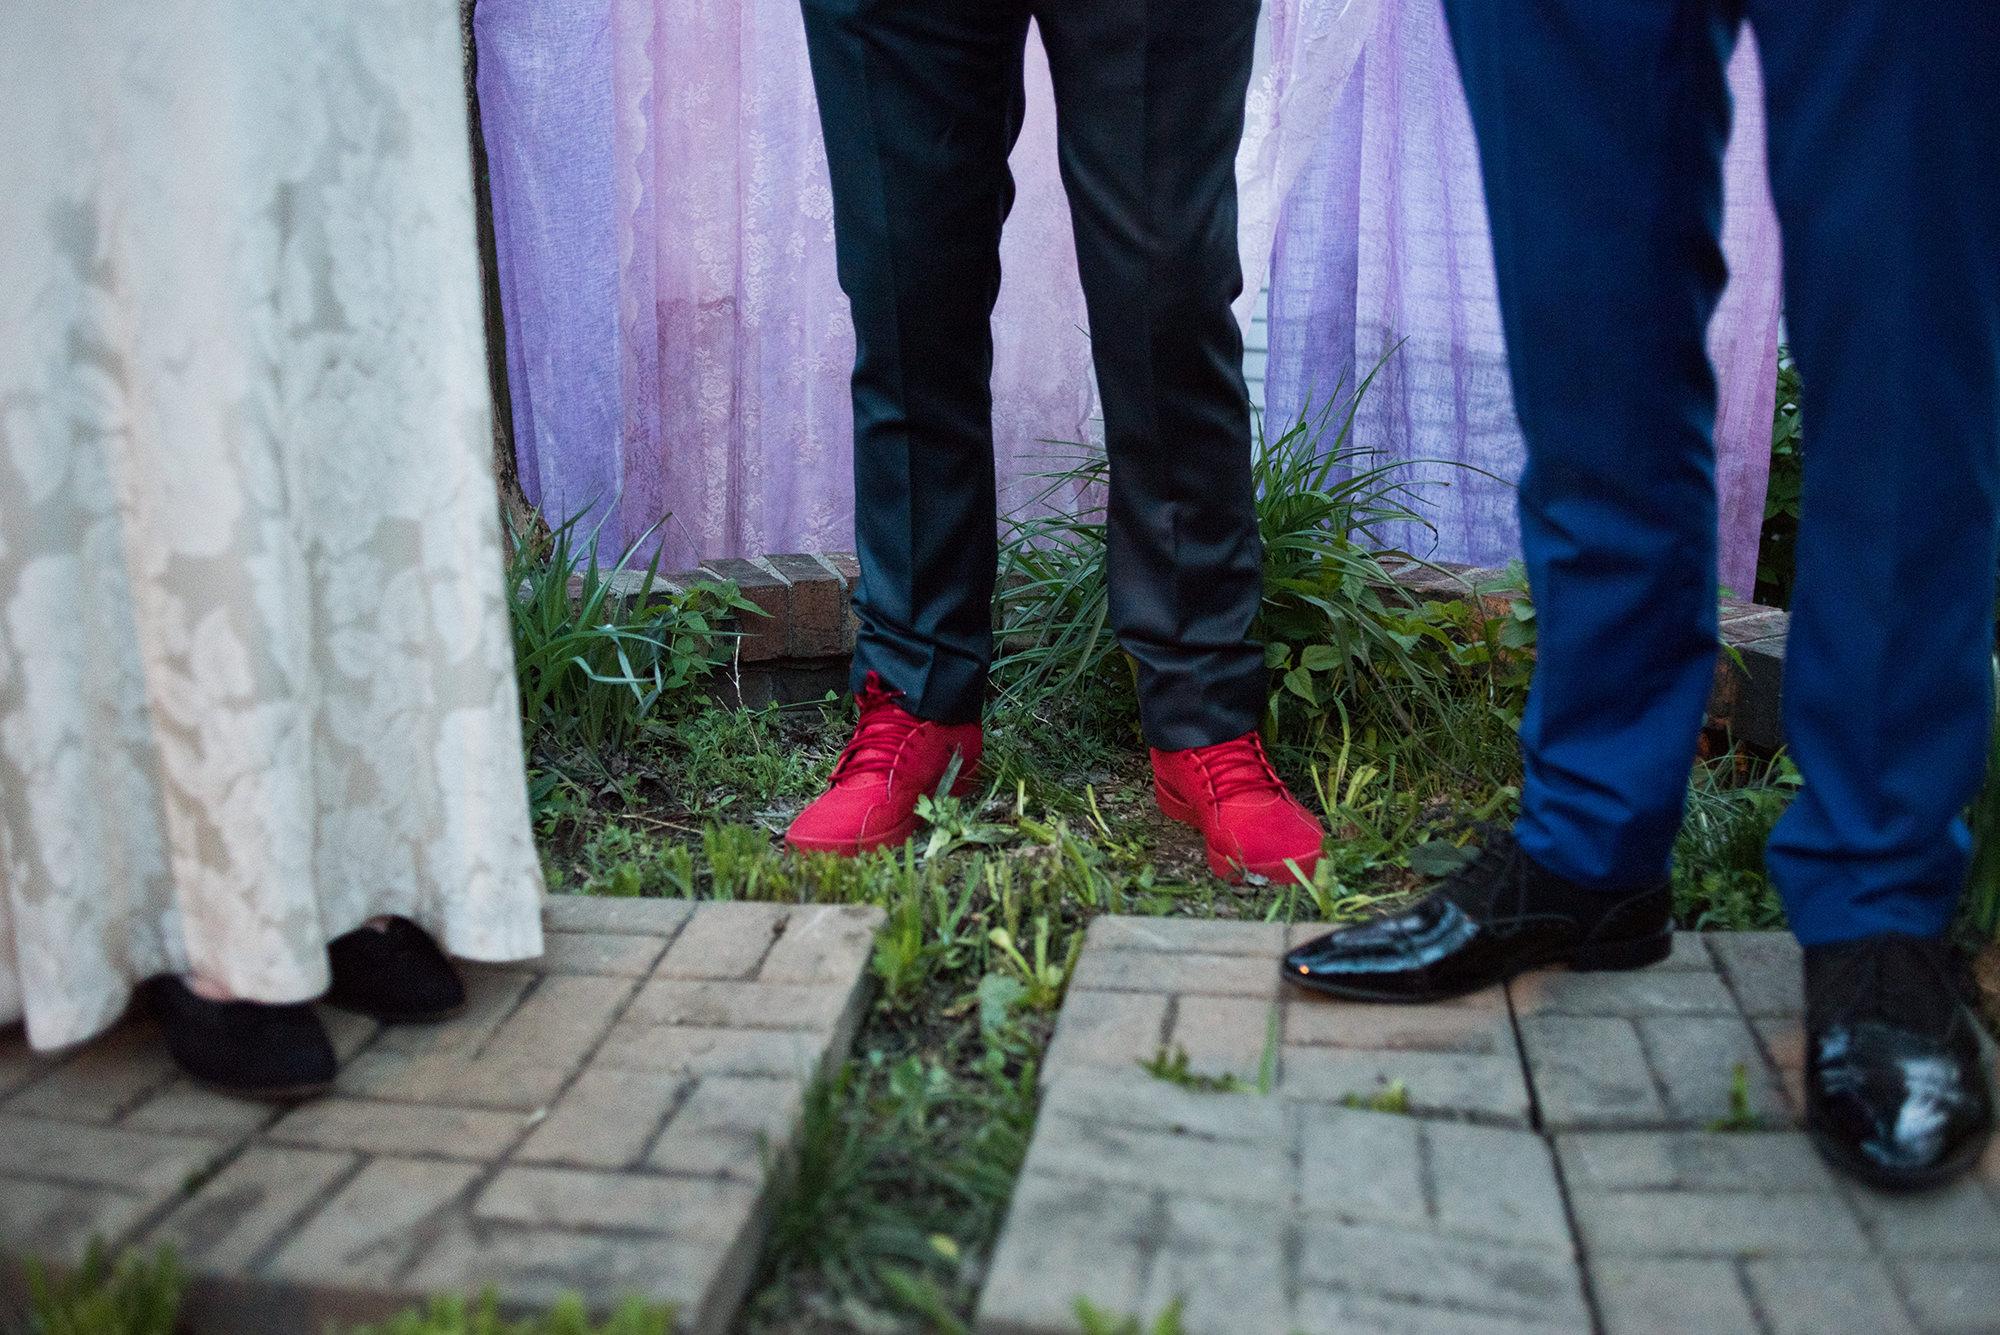 RED SHOES AT BACKYARD OMAHA WEDDING.jpg